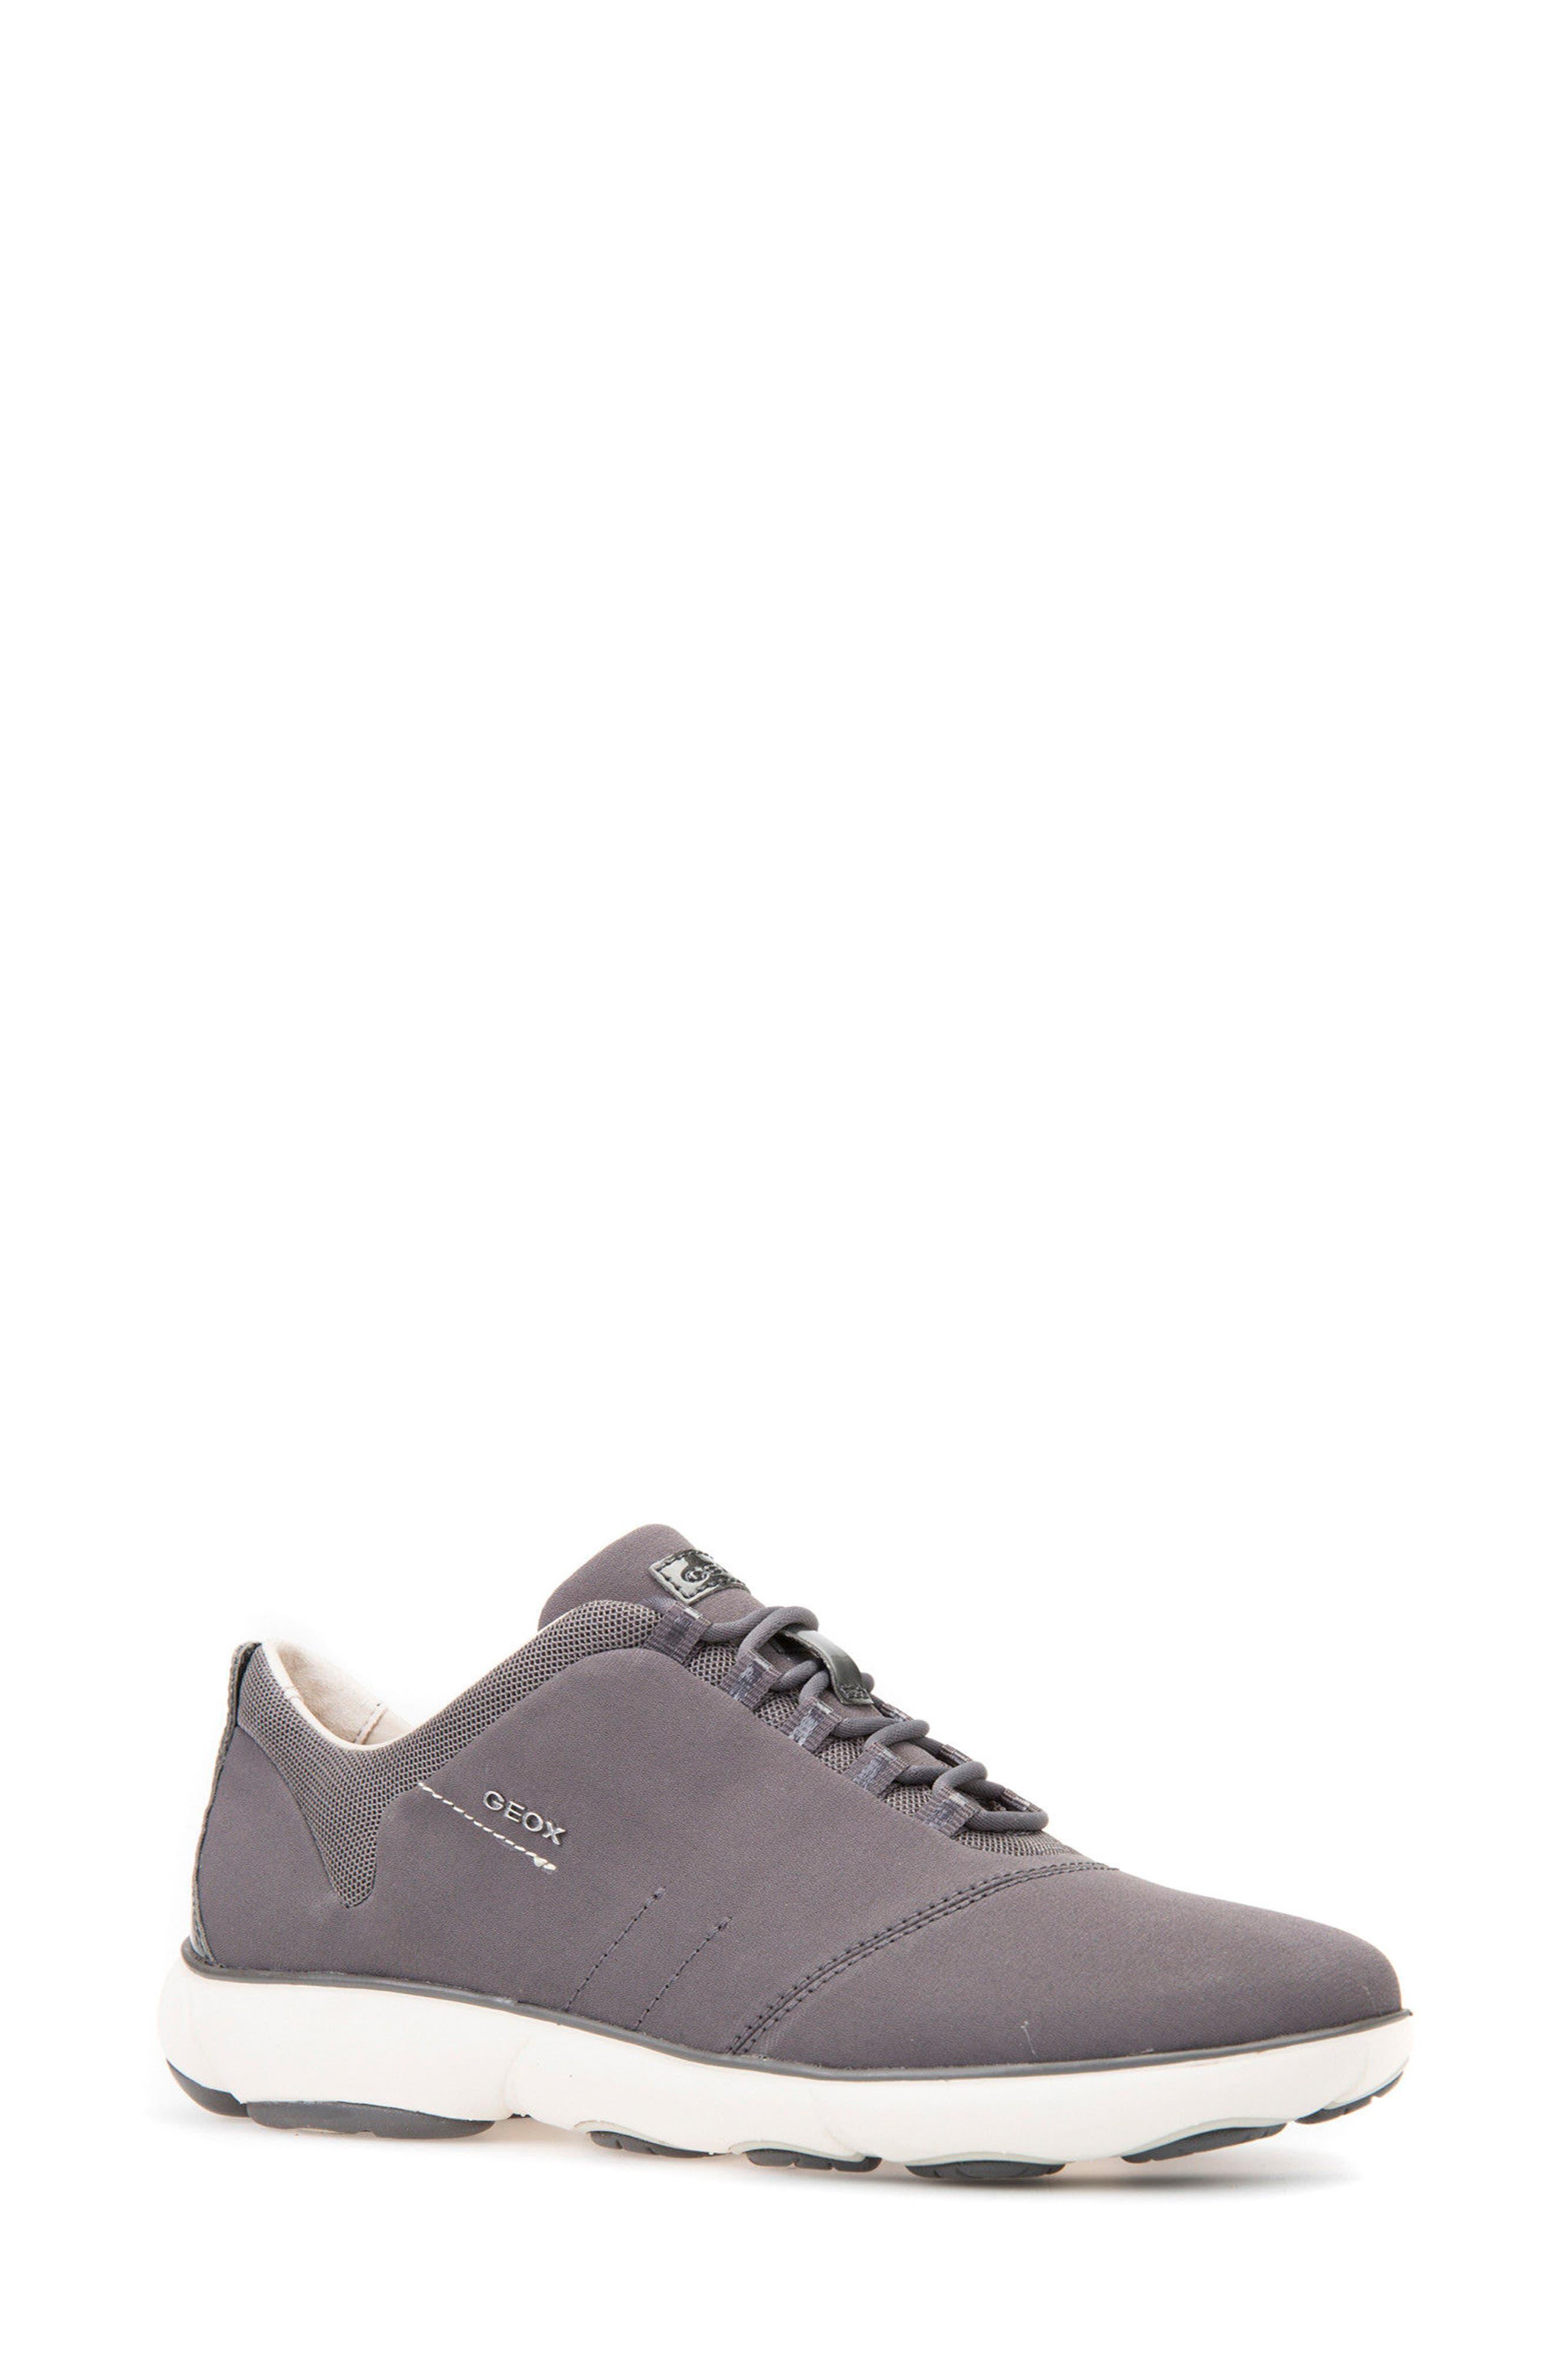 Nebula Slip-On Sneaker,                             Main thumbnail 2, color,